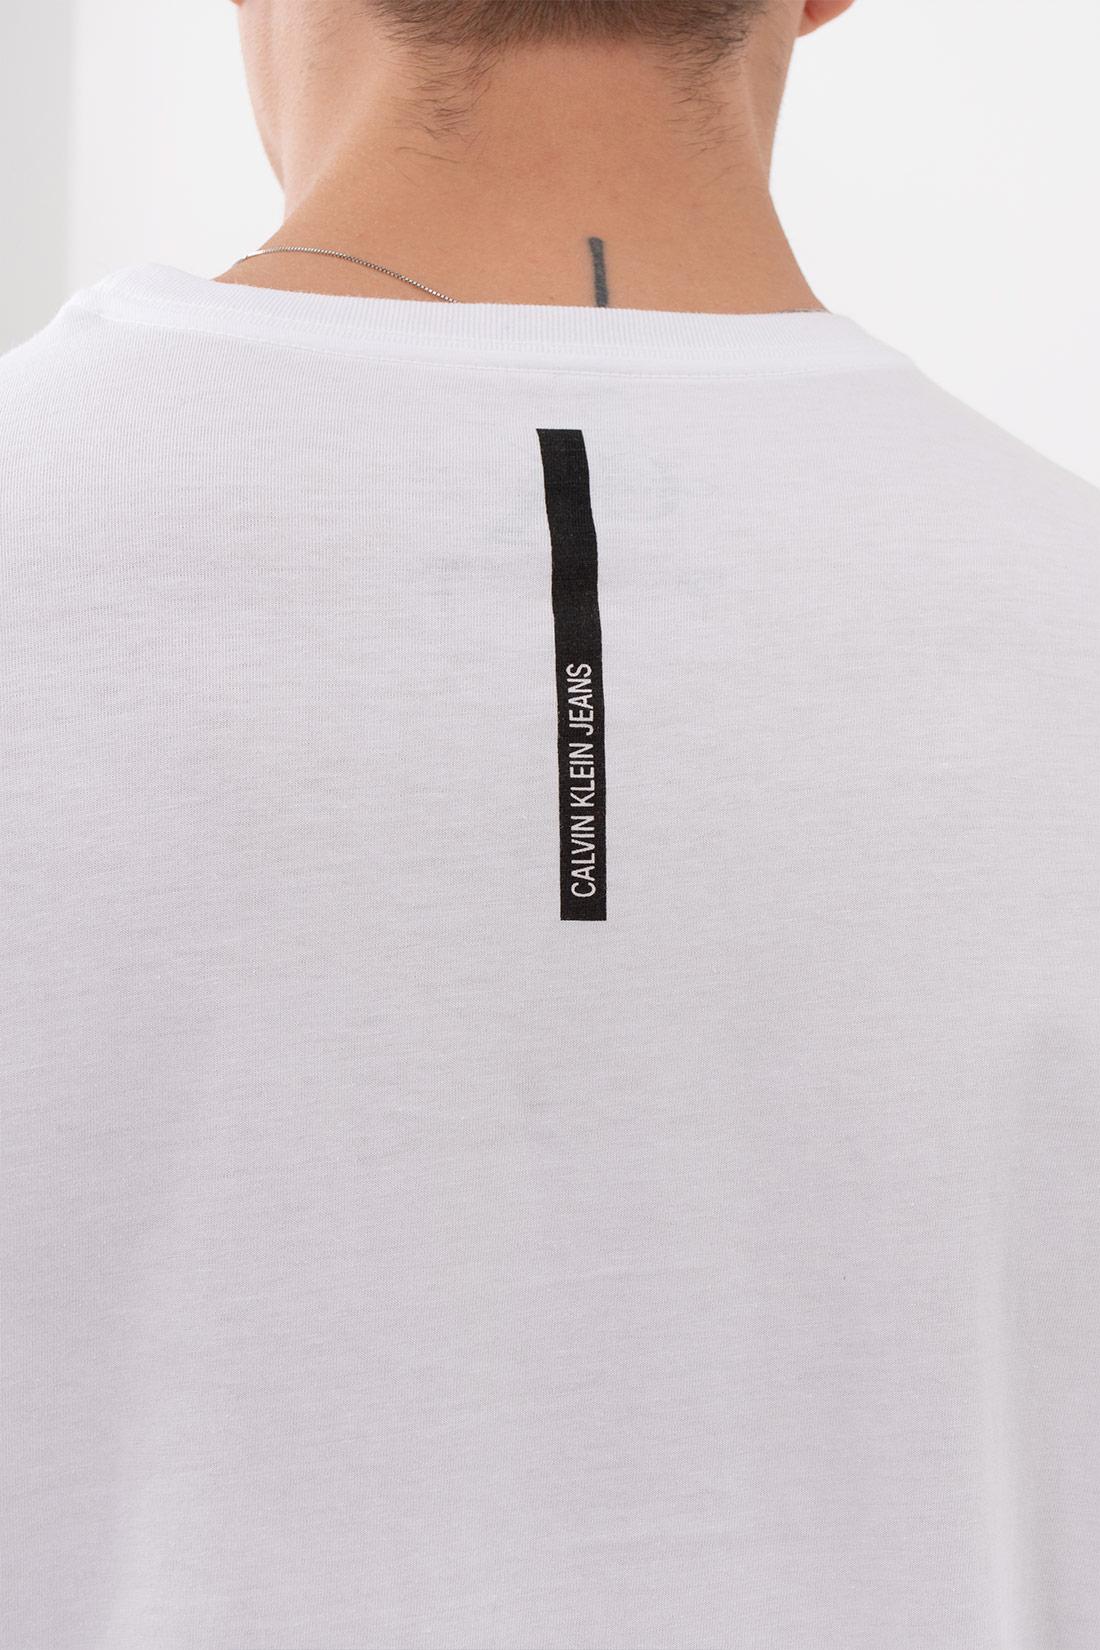 Camiseta Mc Calvin Klein Logo Retangulo